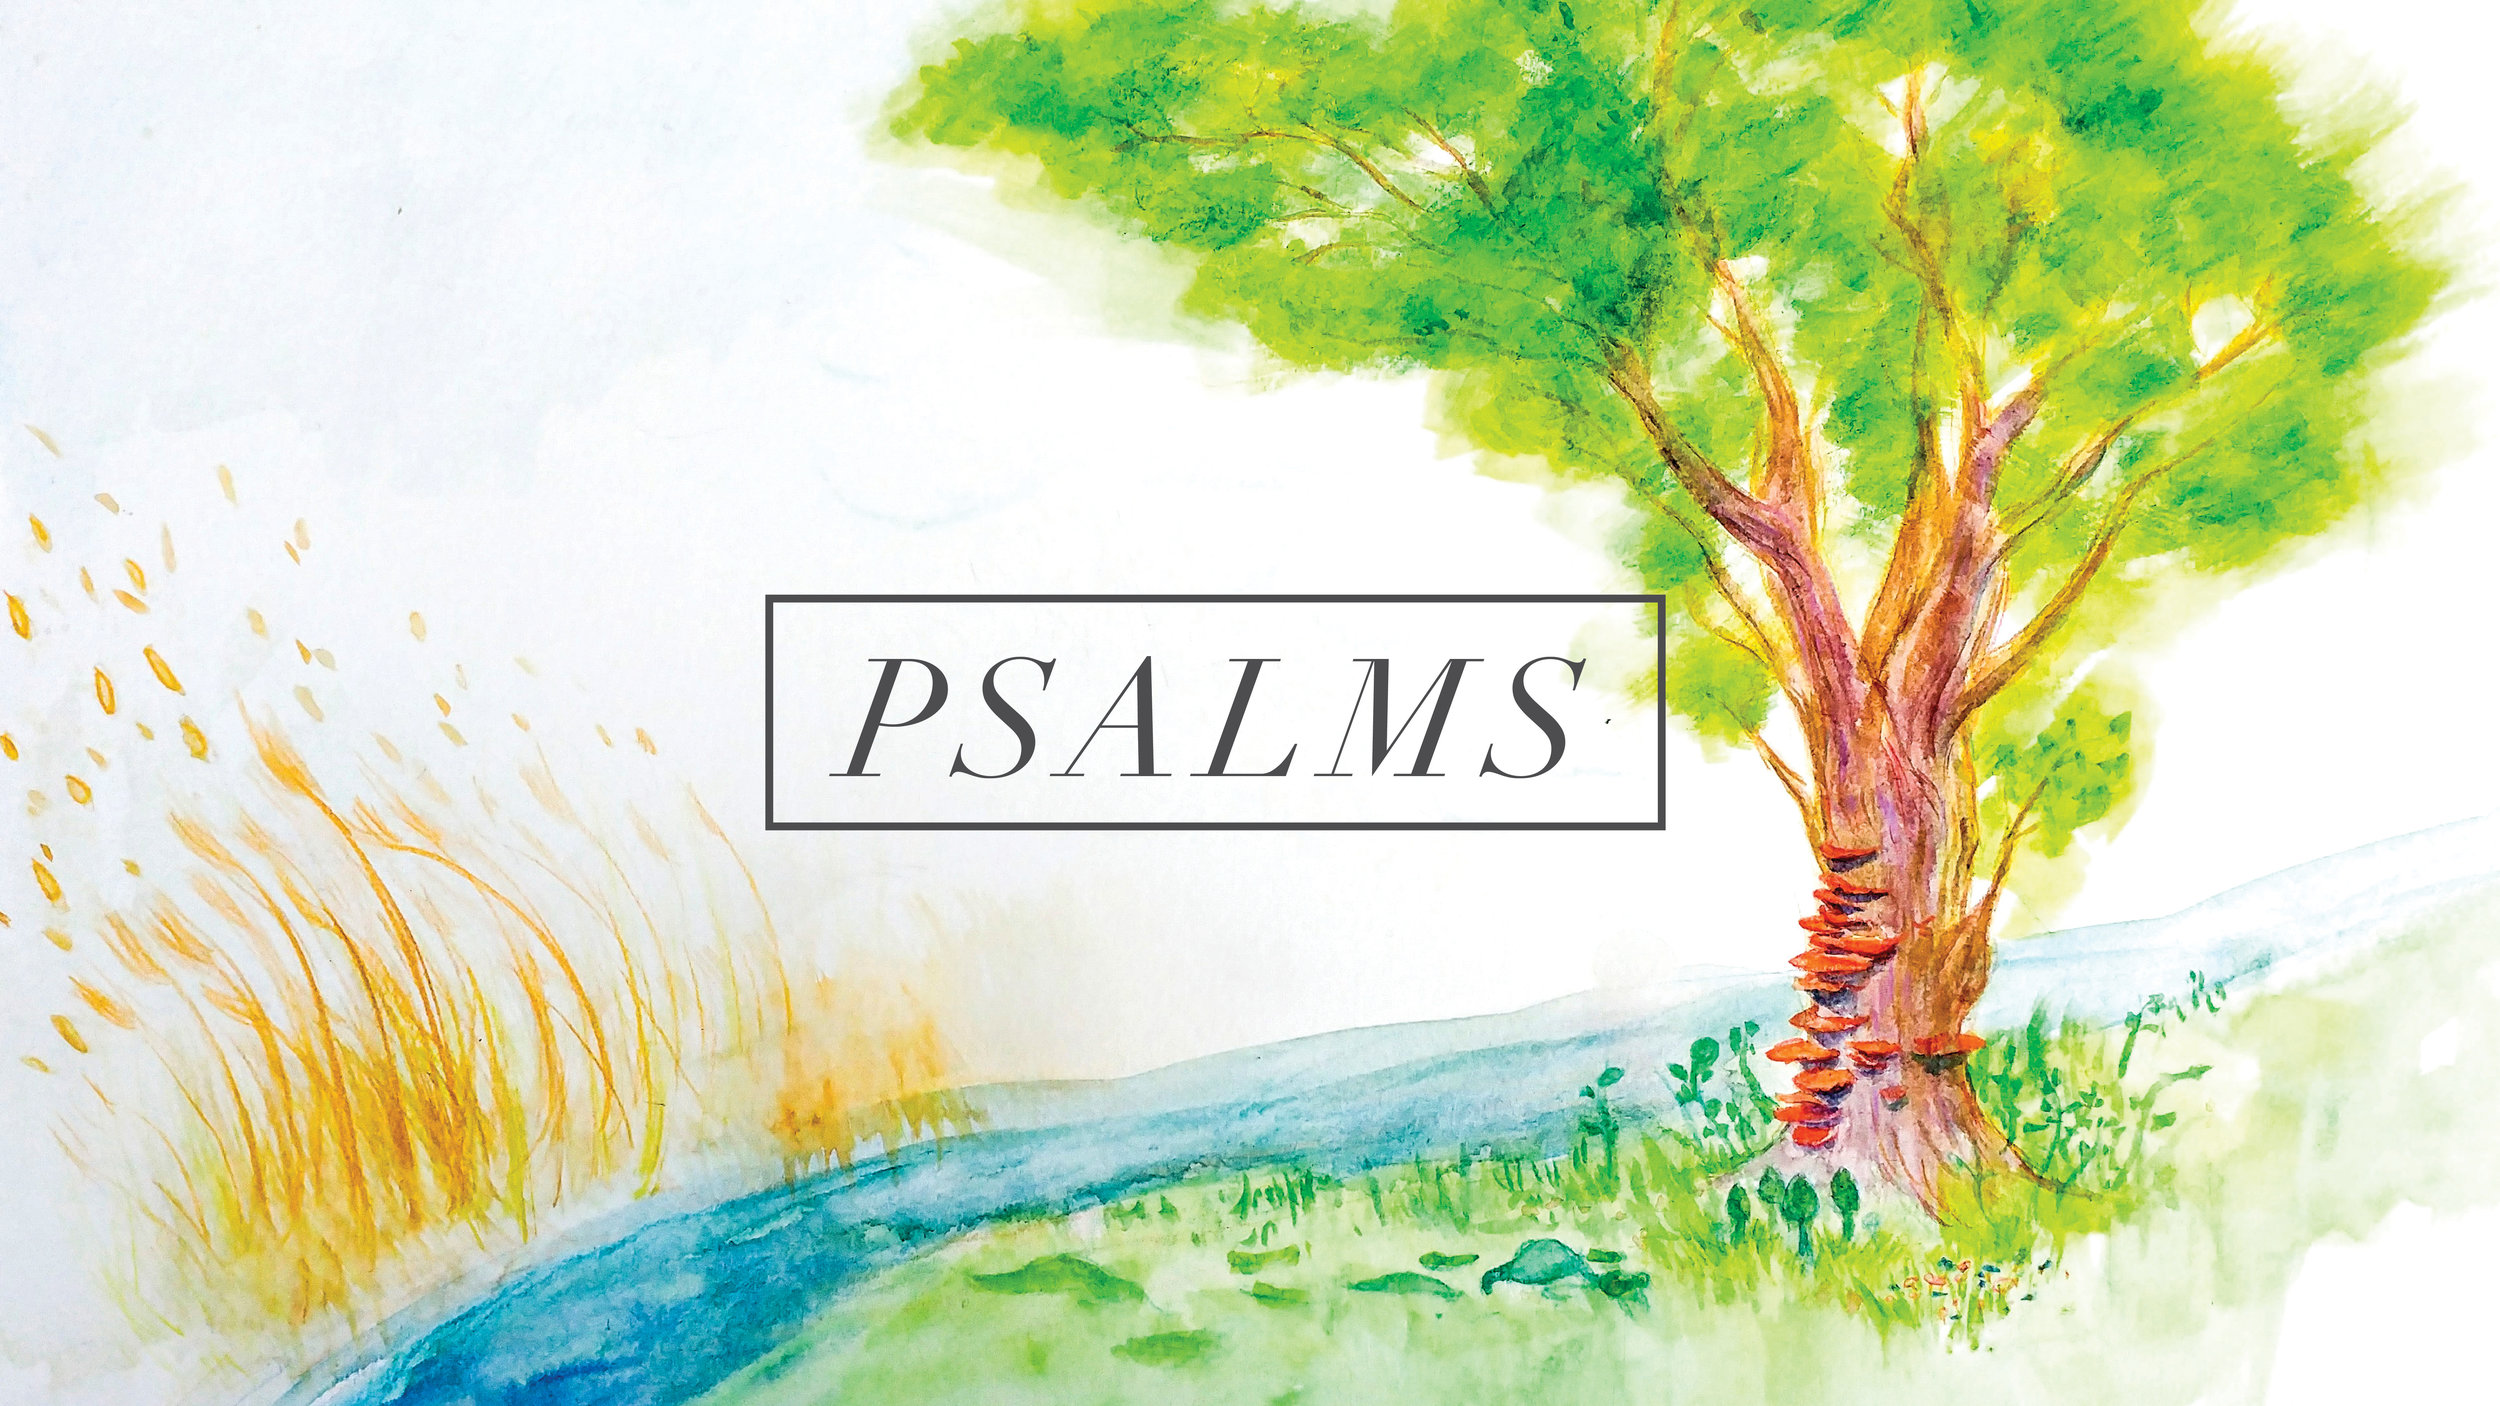 Psalms 1-10 - Summer 2018